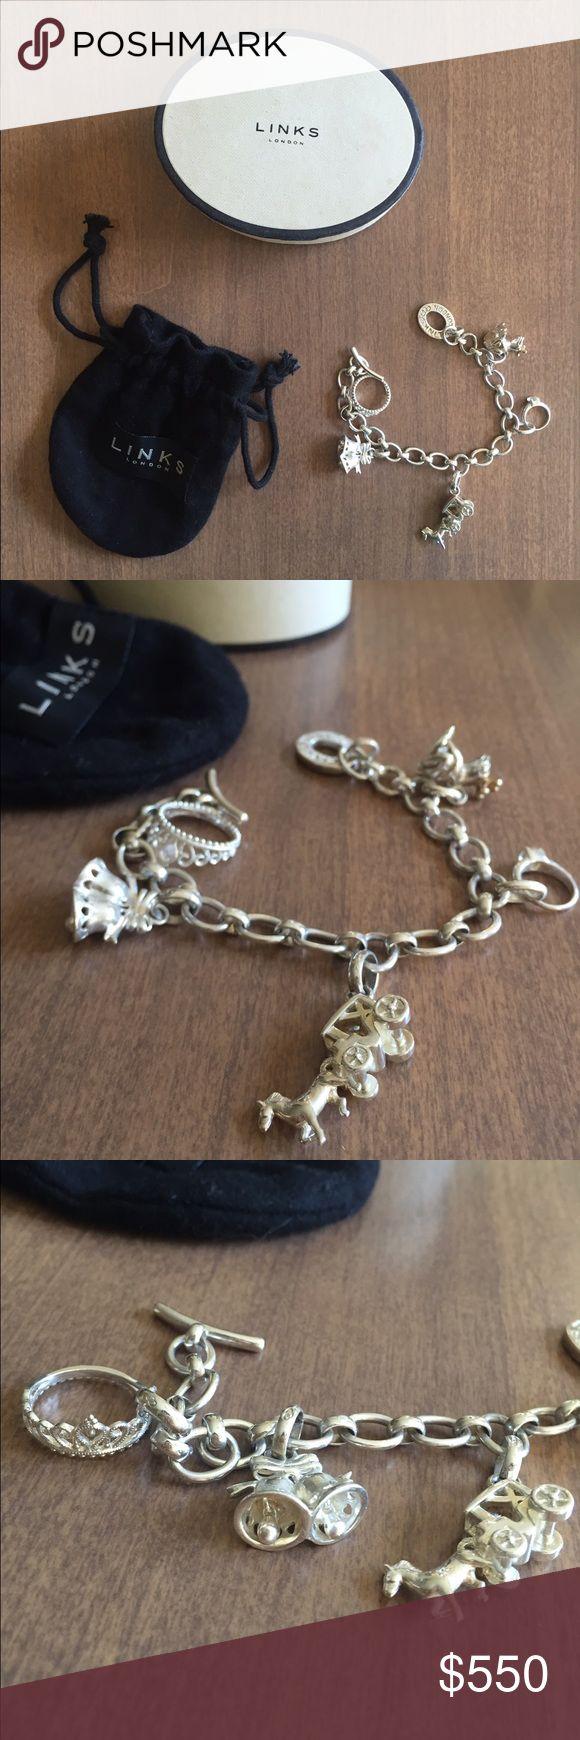 Venture mens black leather bracelet men bracelets links of london - Flash Sale Rare Links Of London Charm Bracelet Nwt